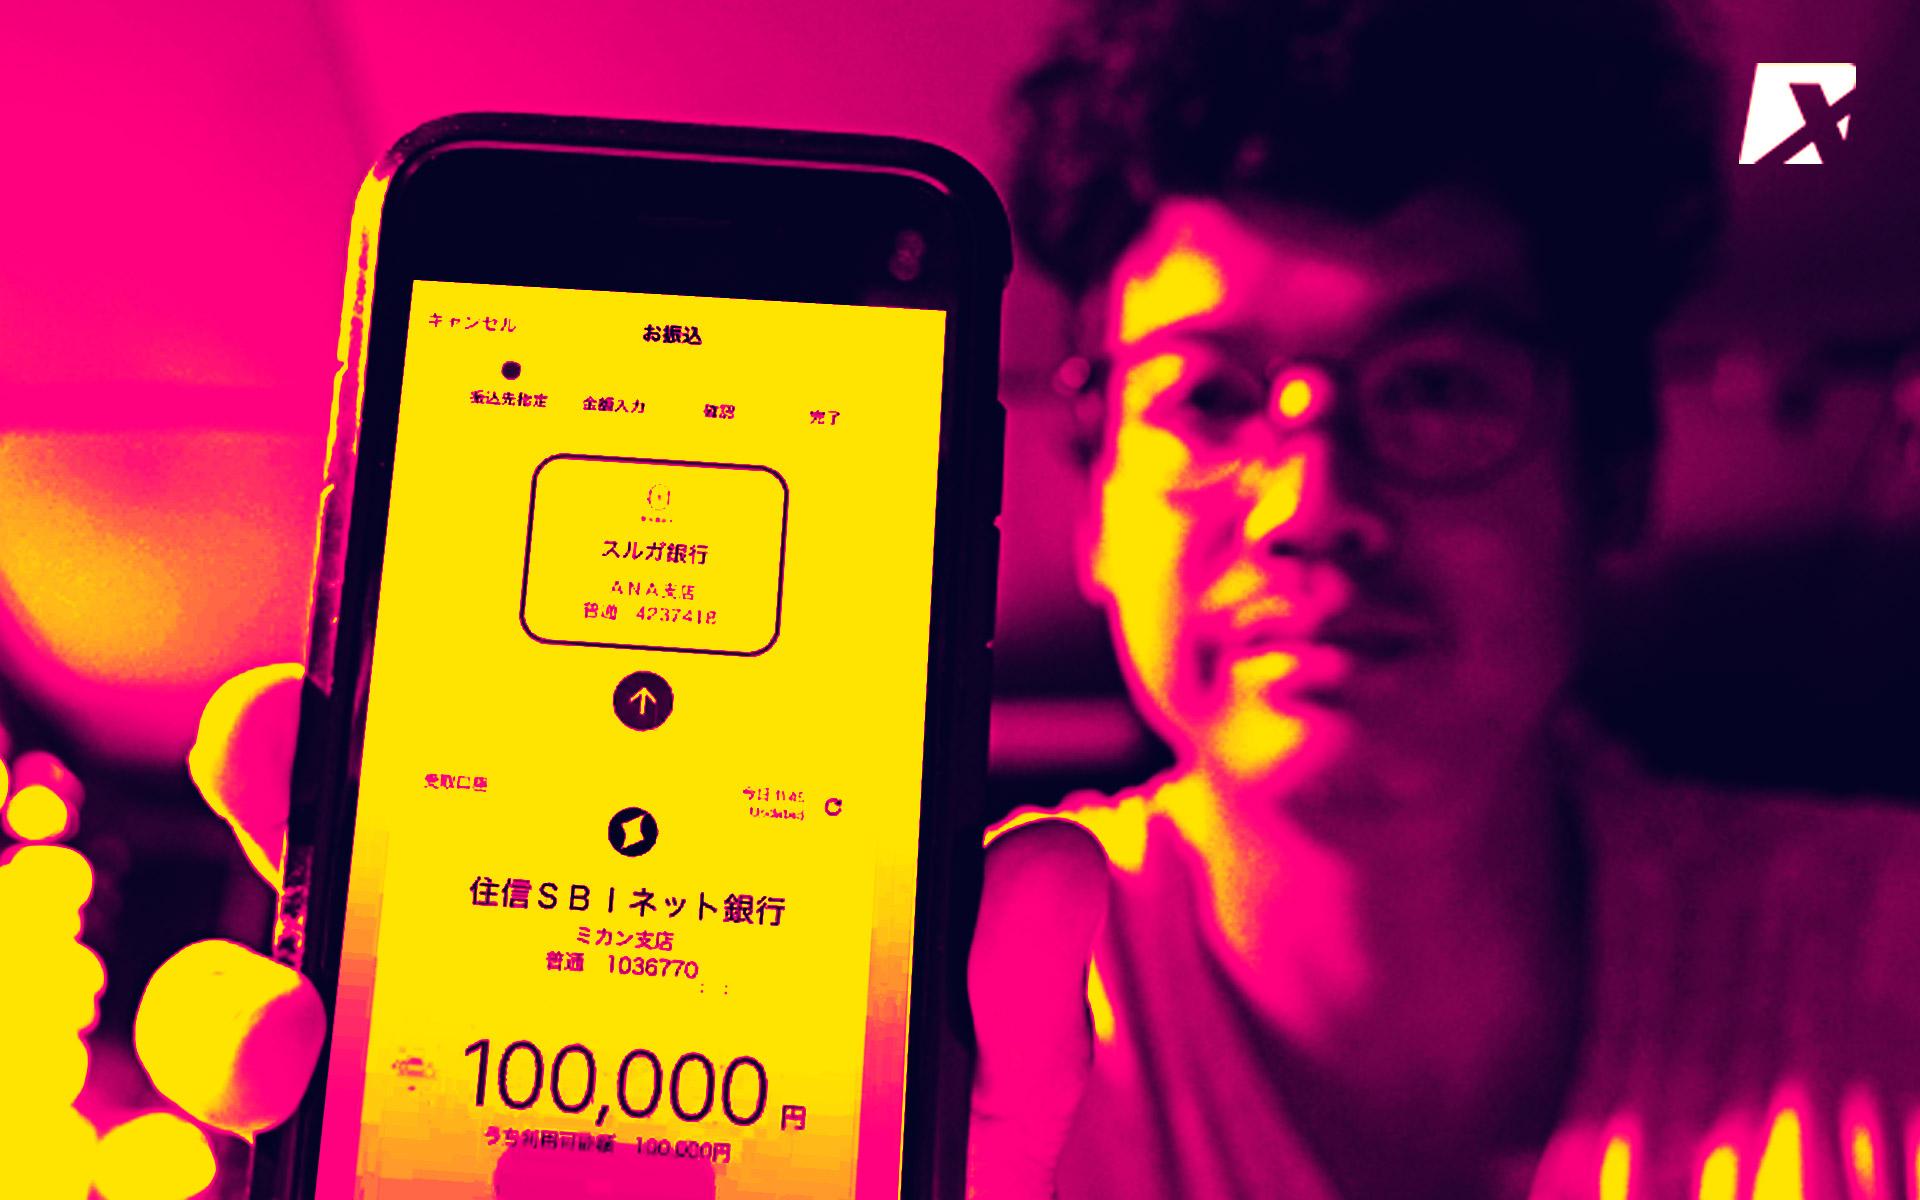 Ripple, SBI Launches MoneyTapp App In Japan